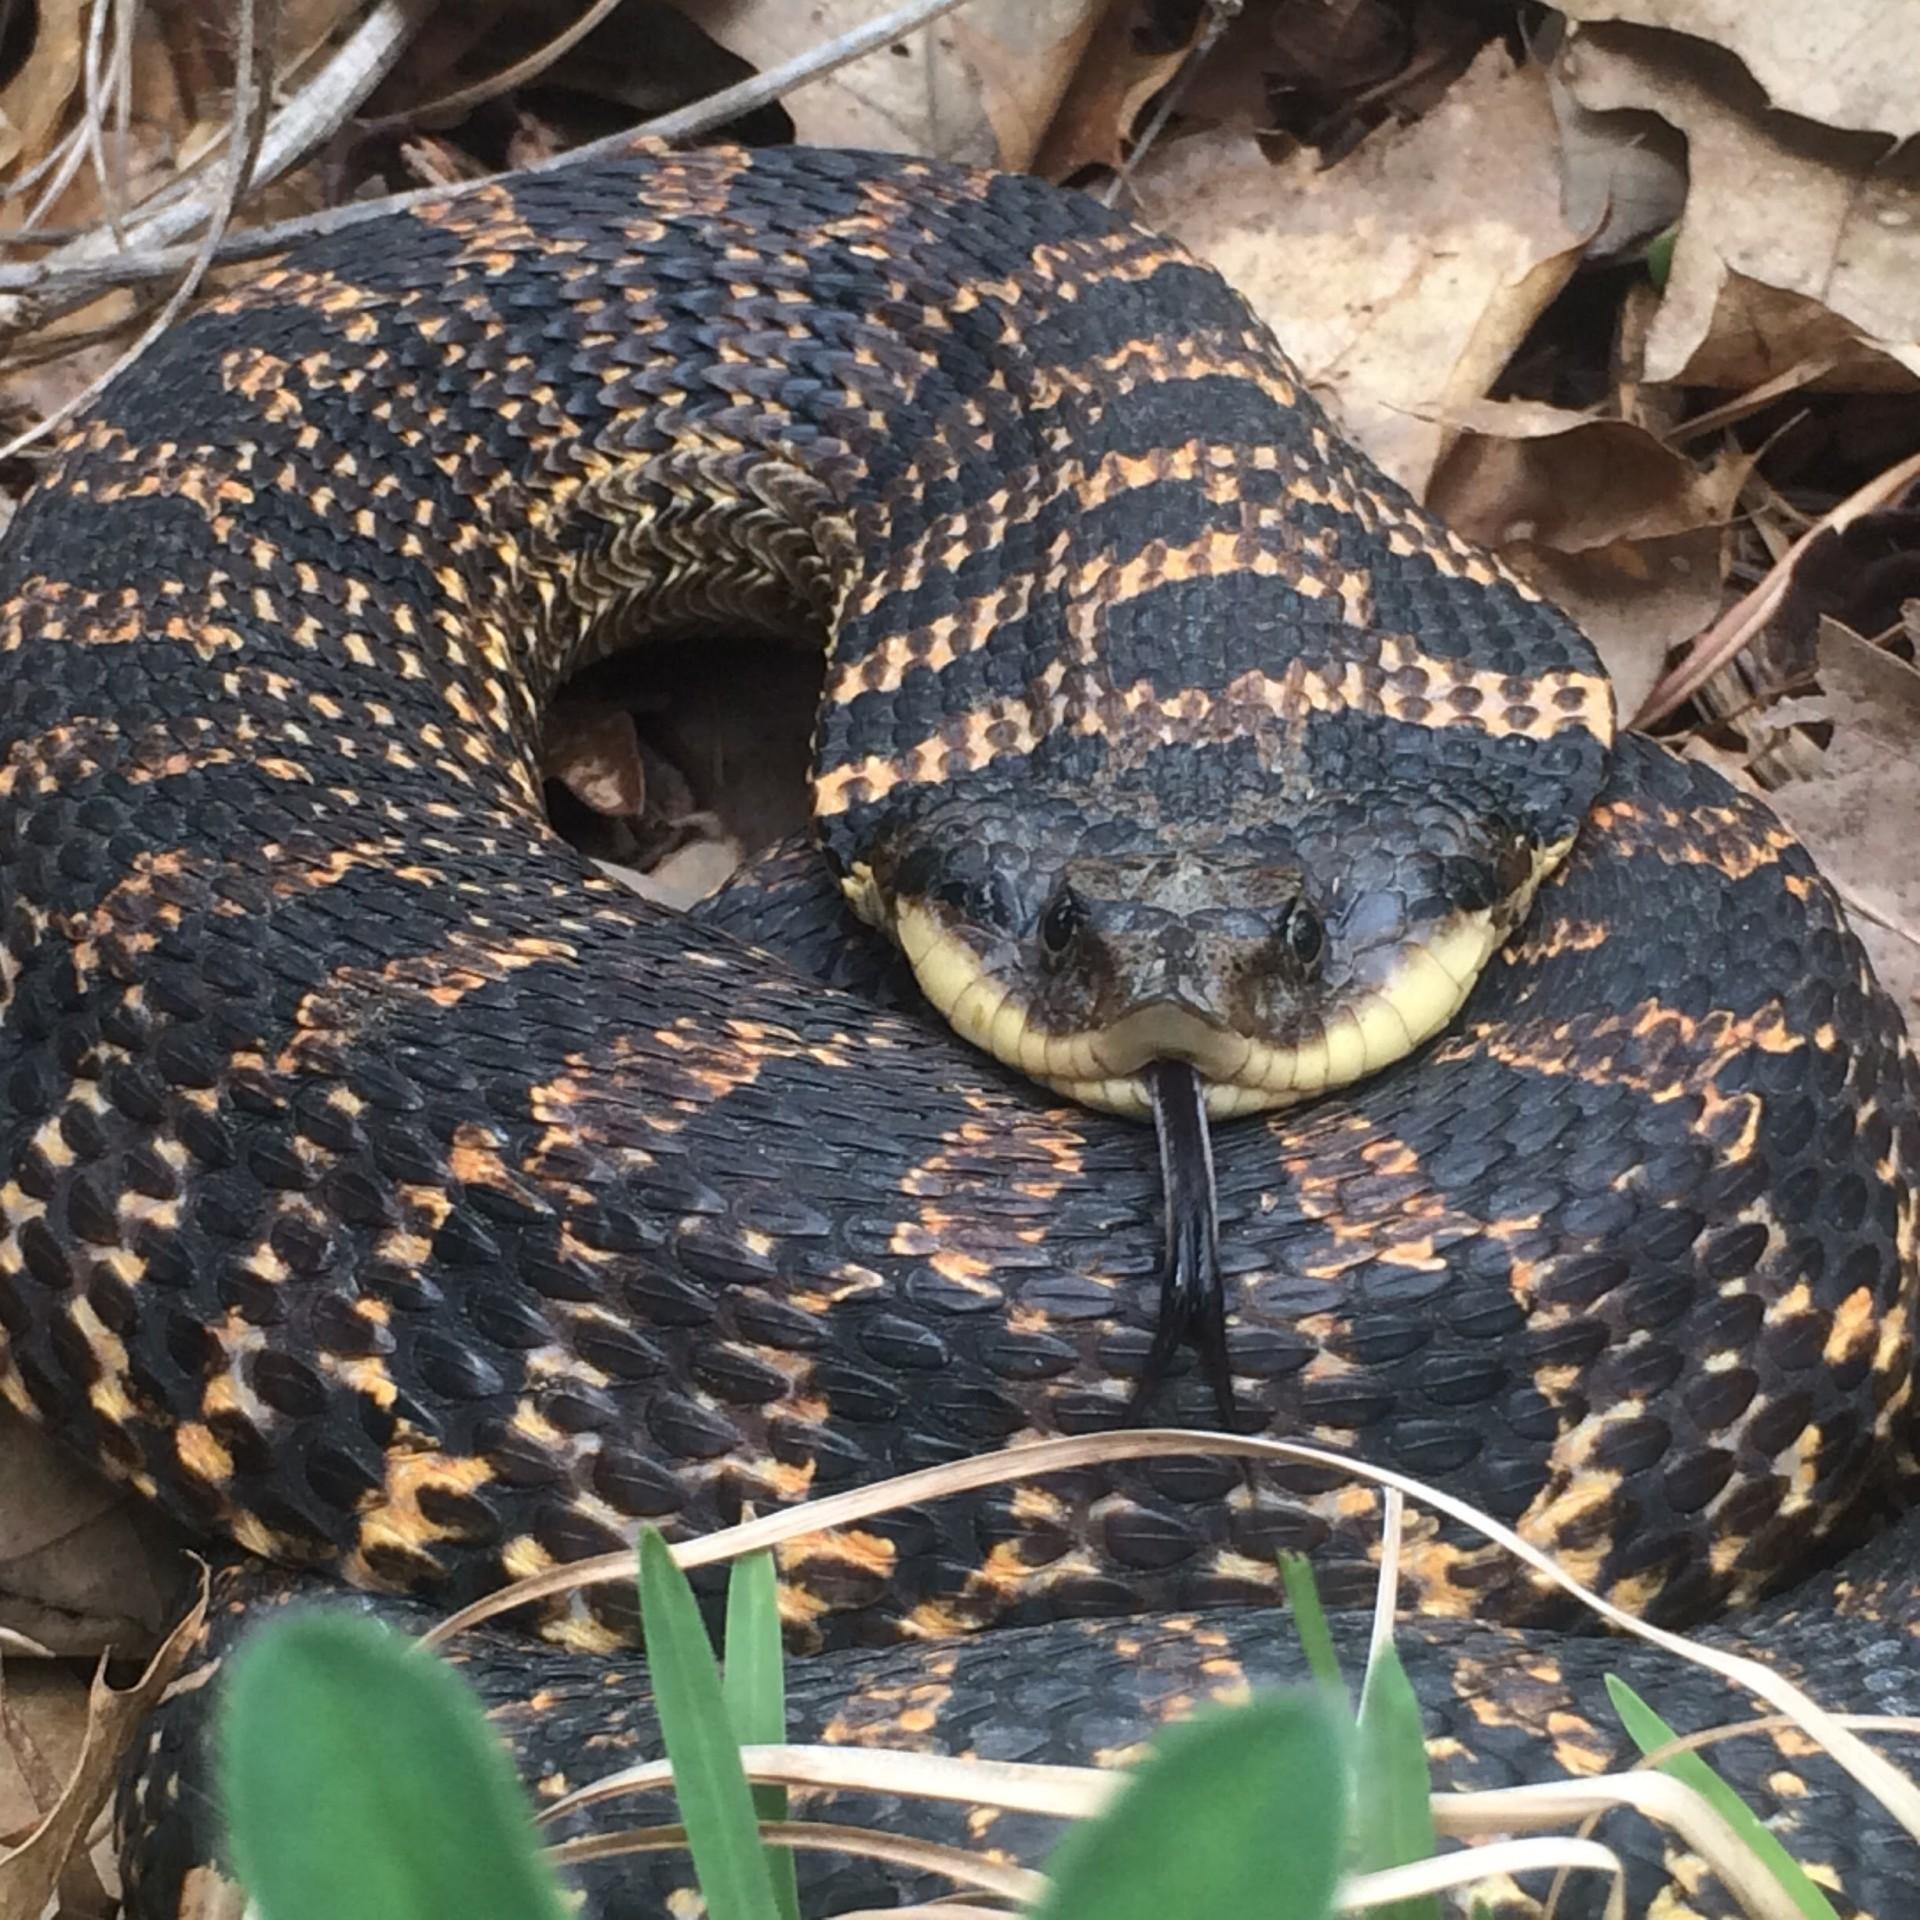 Hognose snake by Melissa Fadden